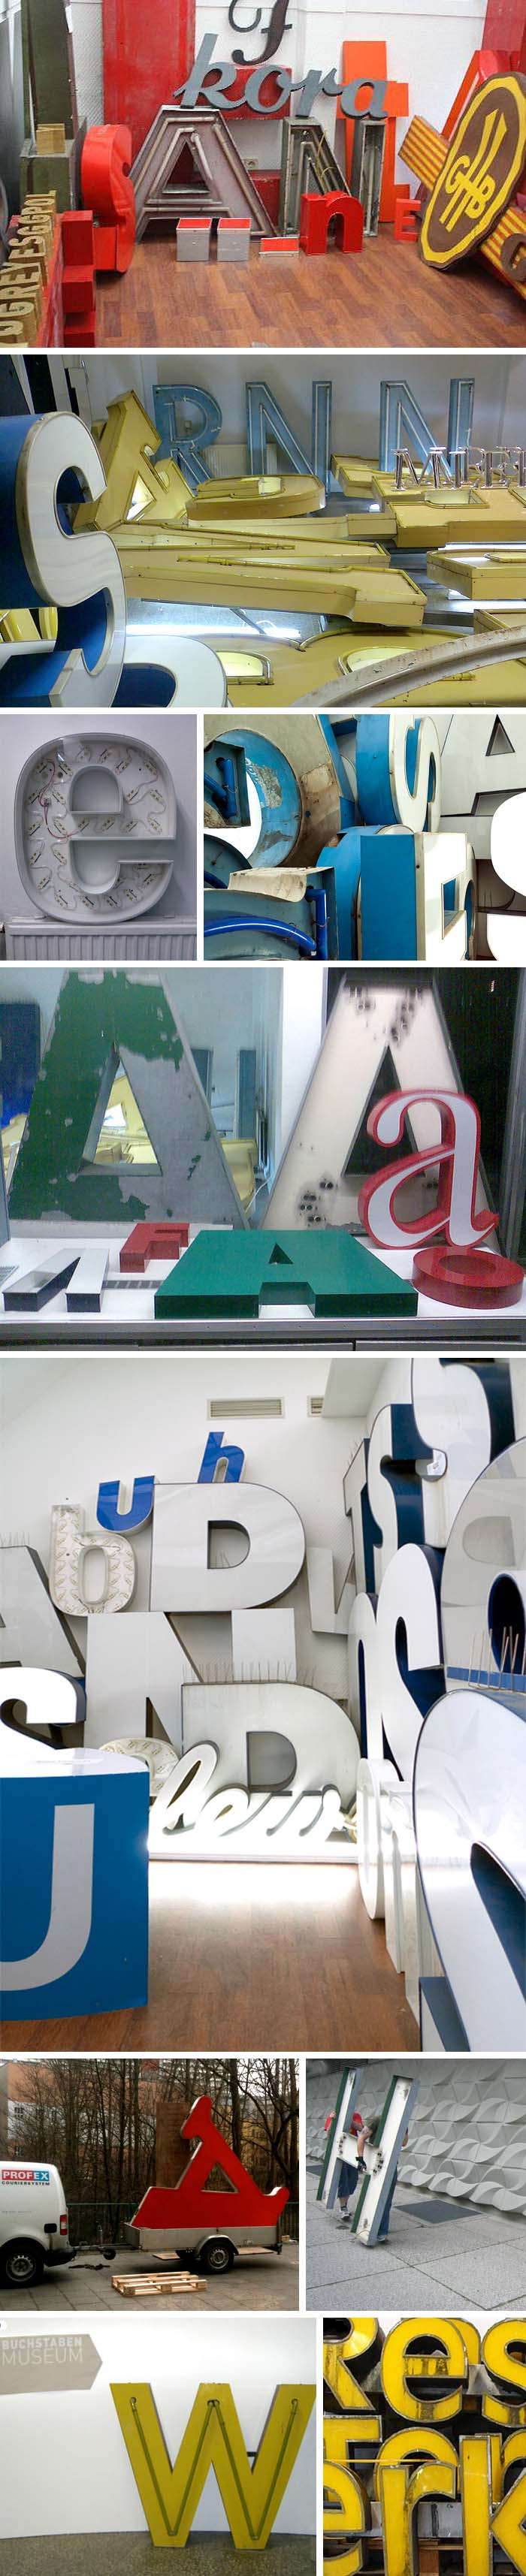 buchstaben museum museum of letters